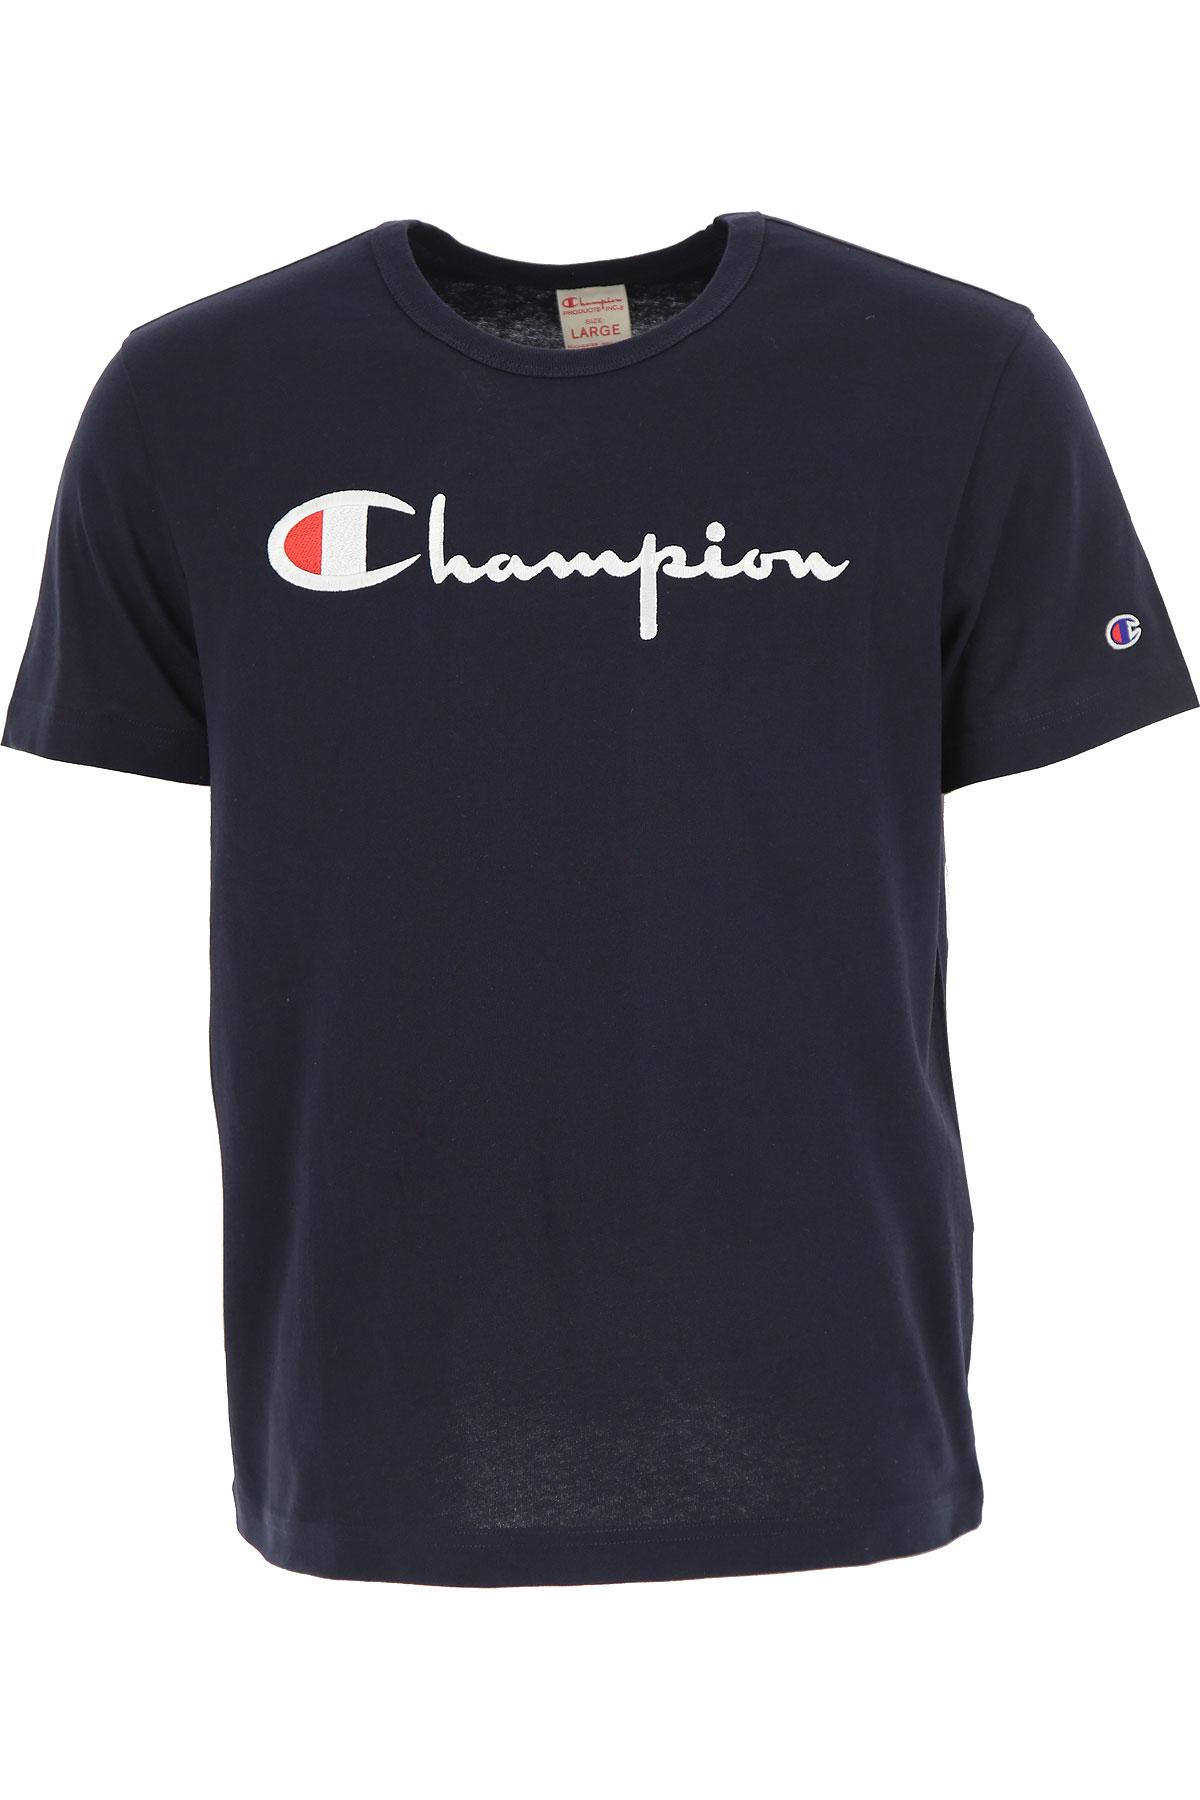 Champion T-Shirt for Men, navy, Cotton, 2017, L M USA-454789